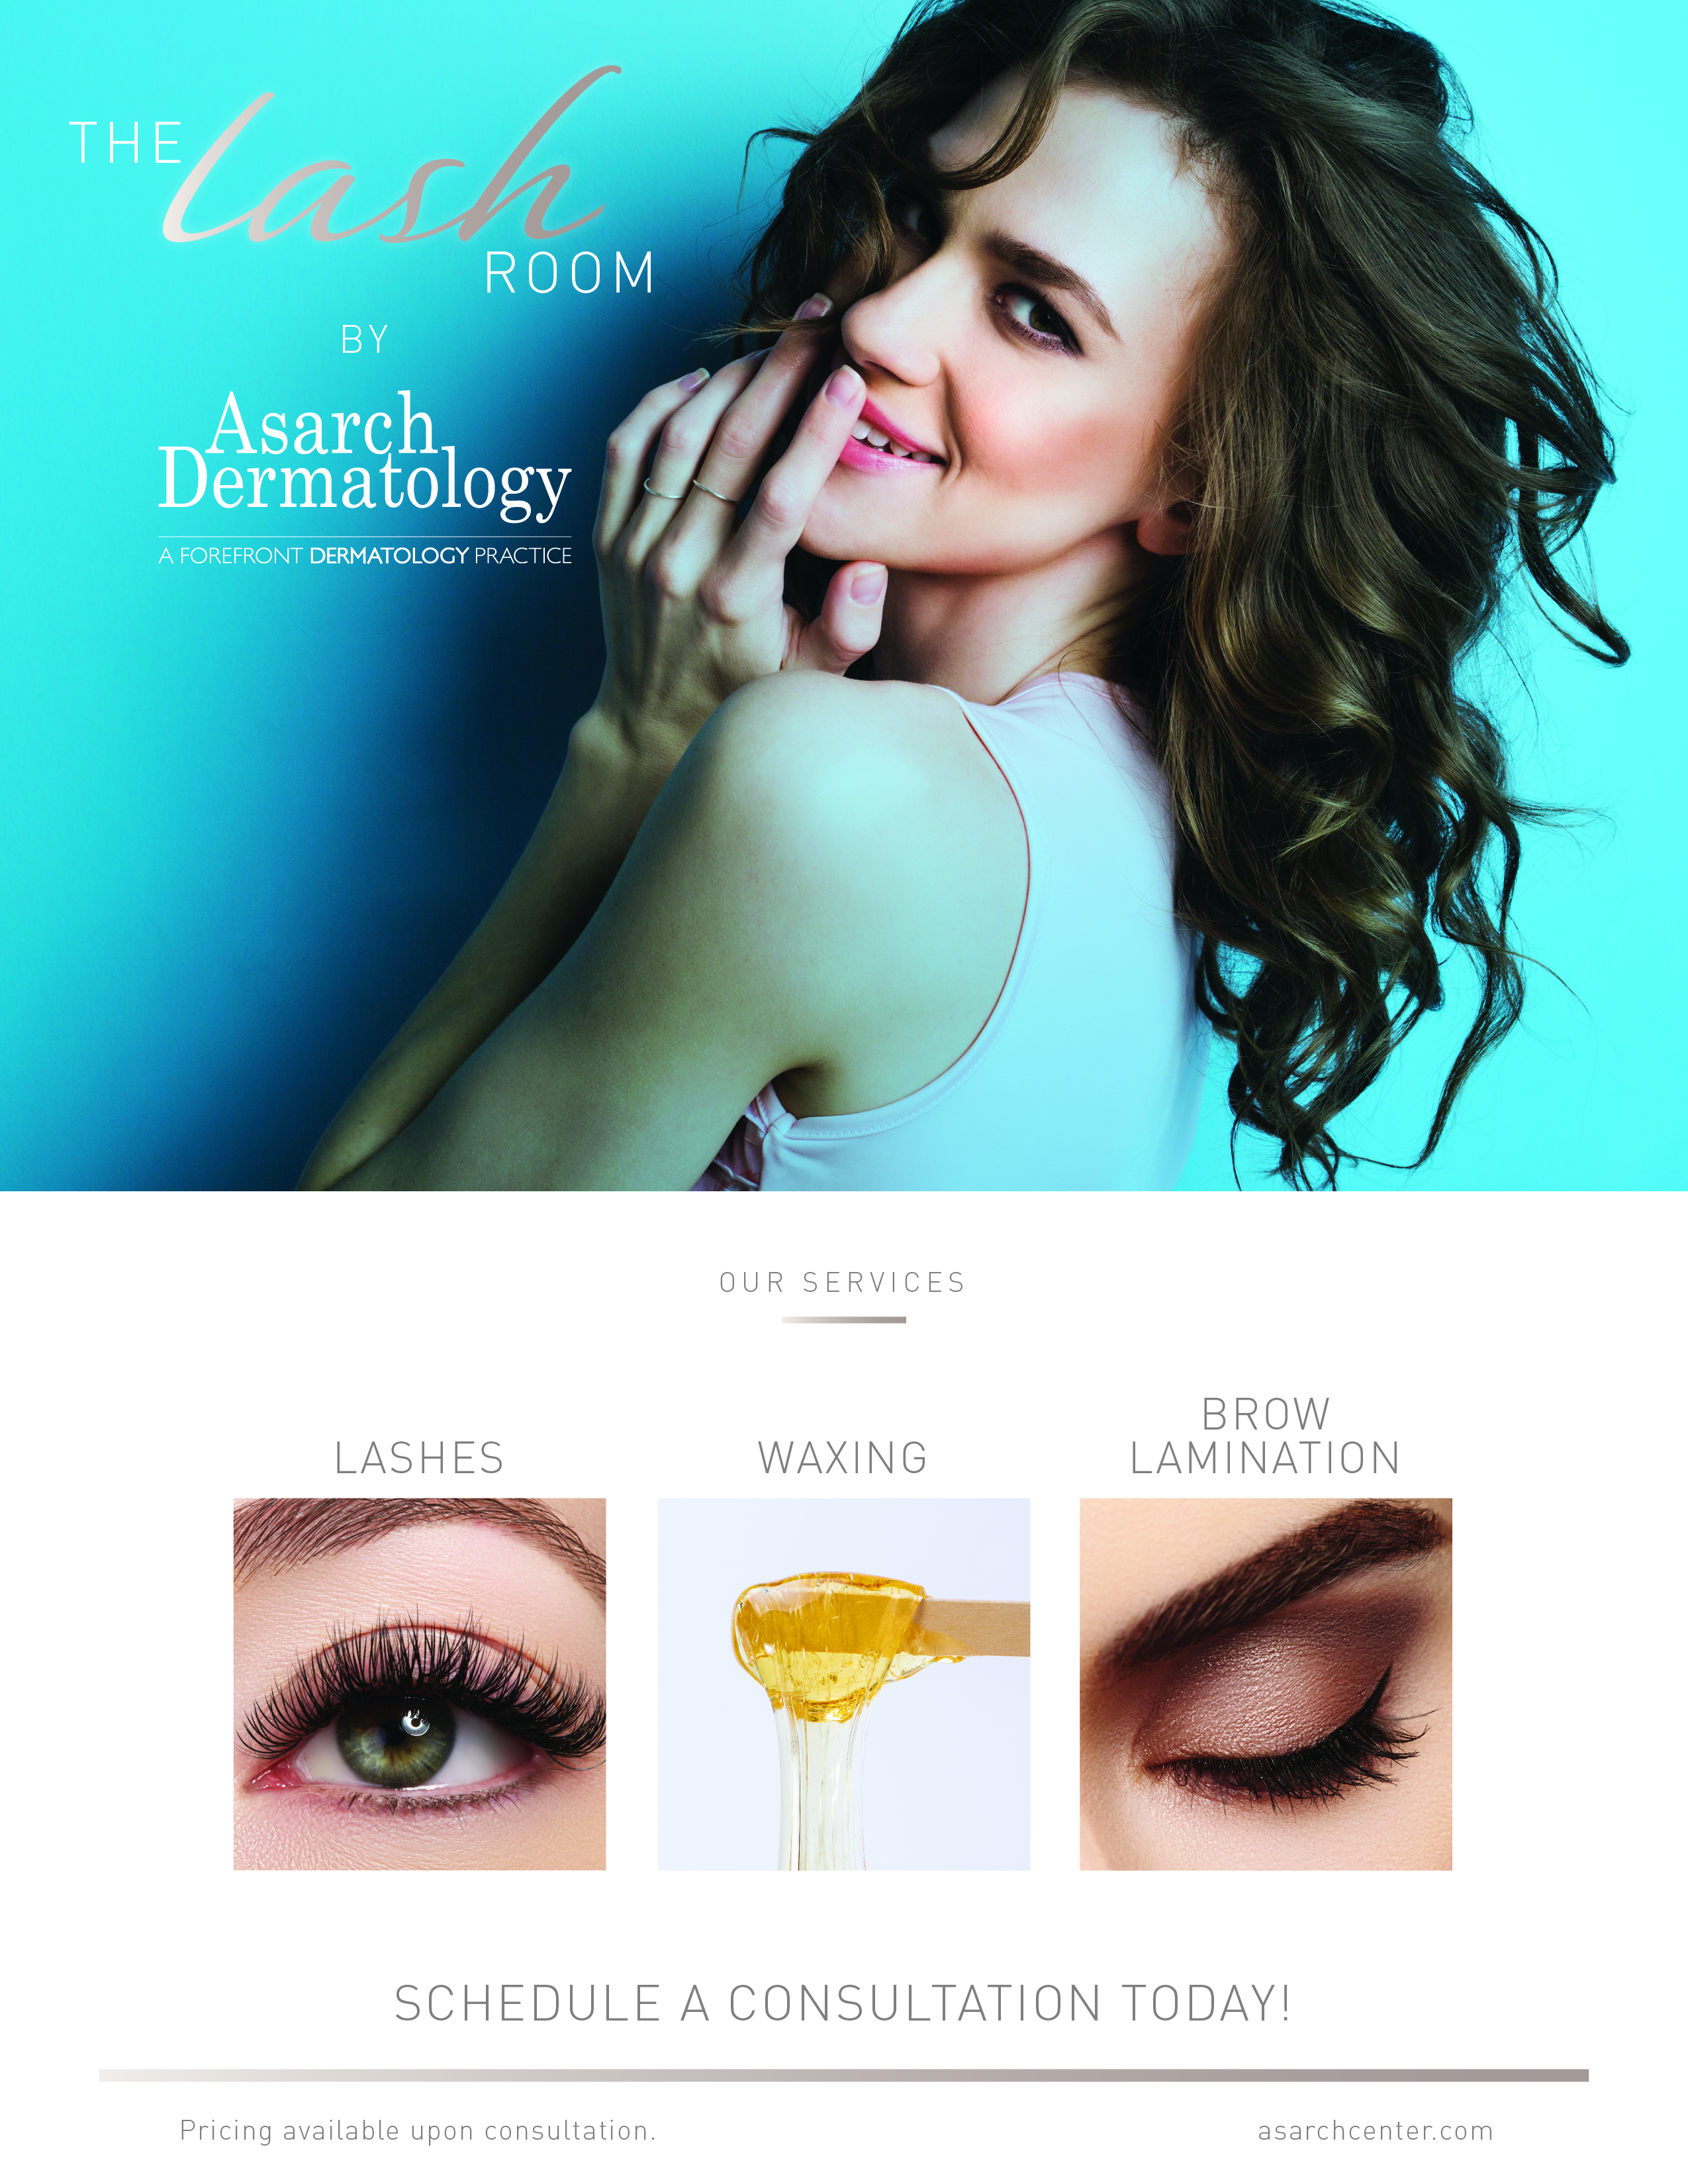 lash room office flyer asarch dermatology feb 2020 1